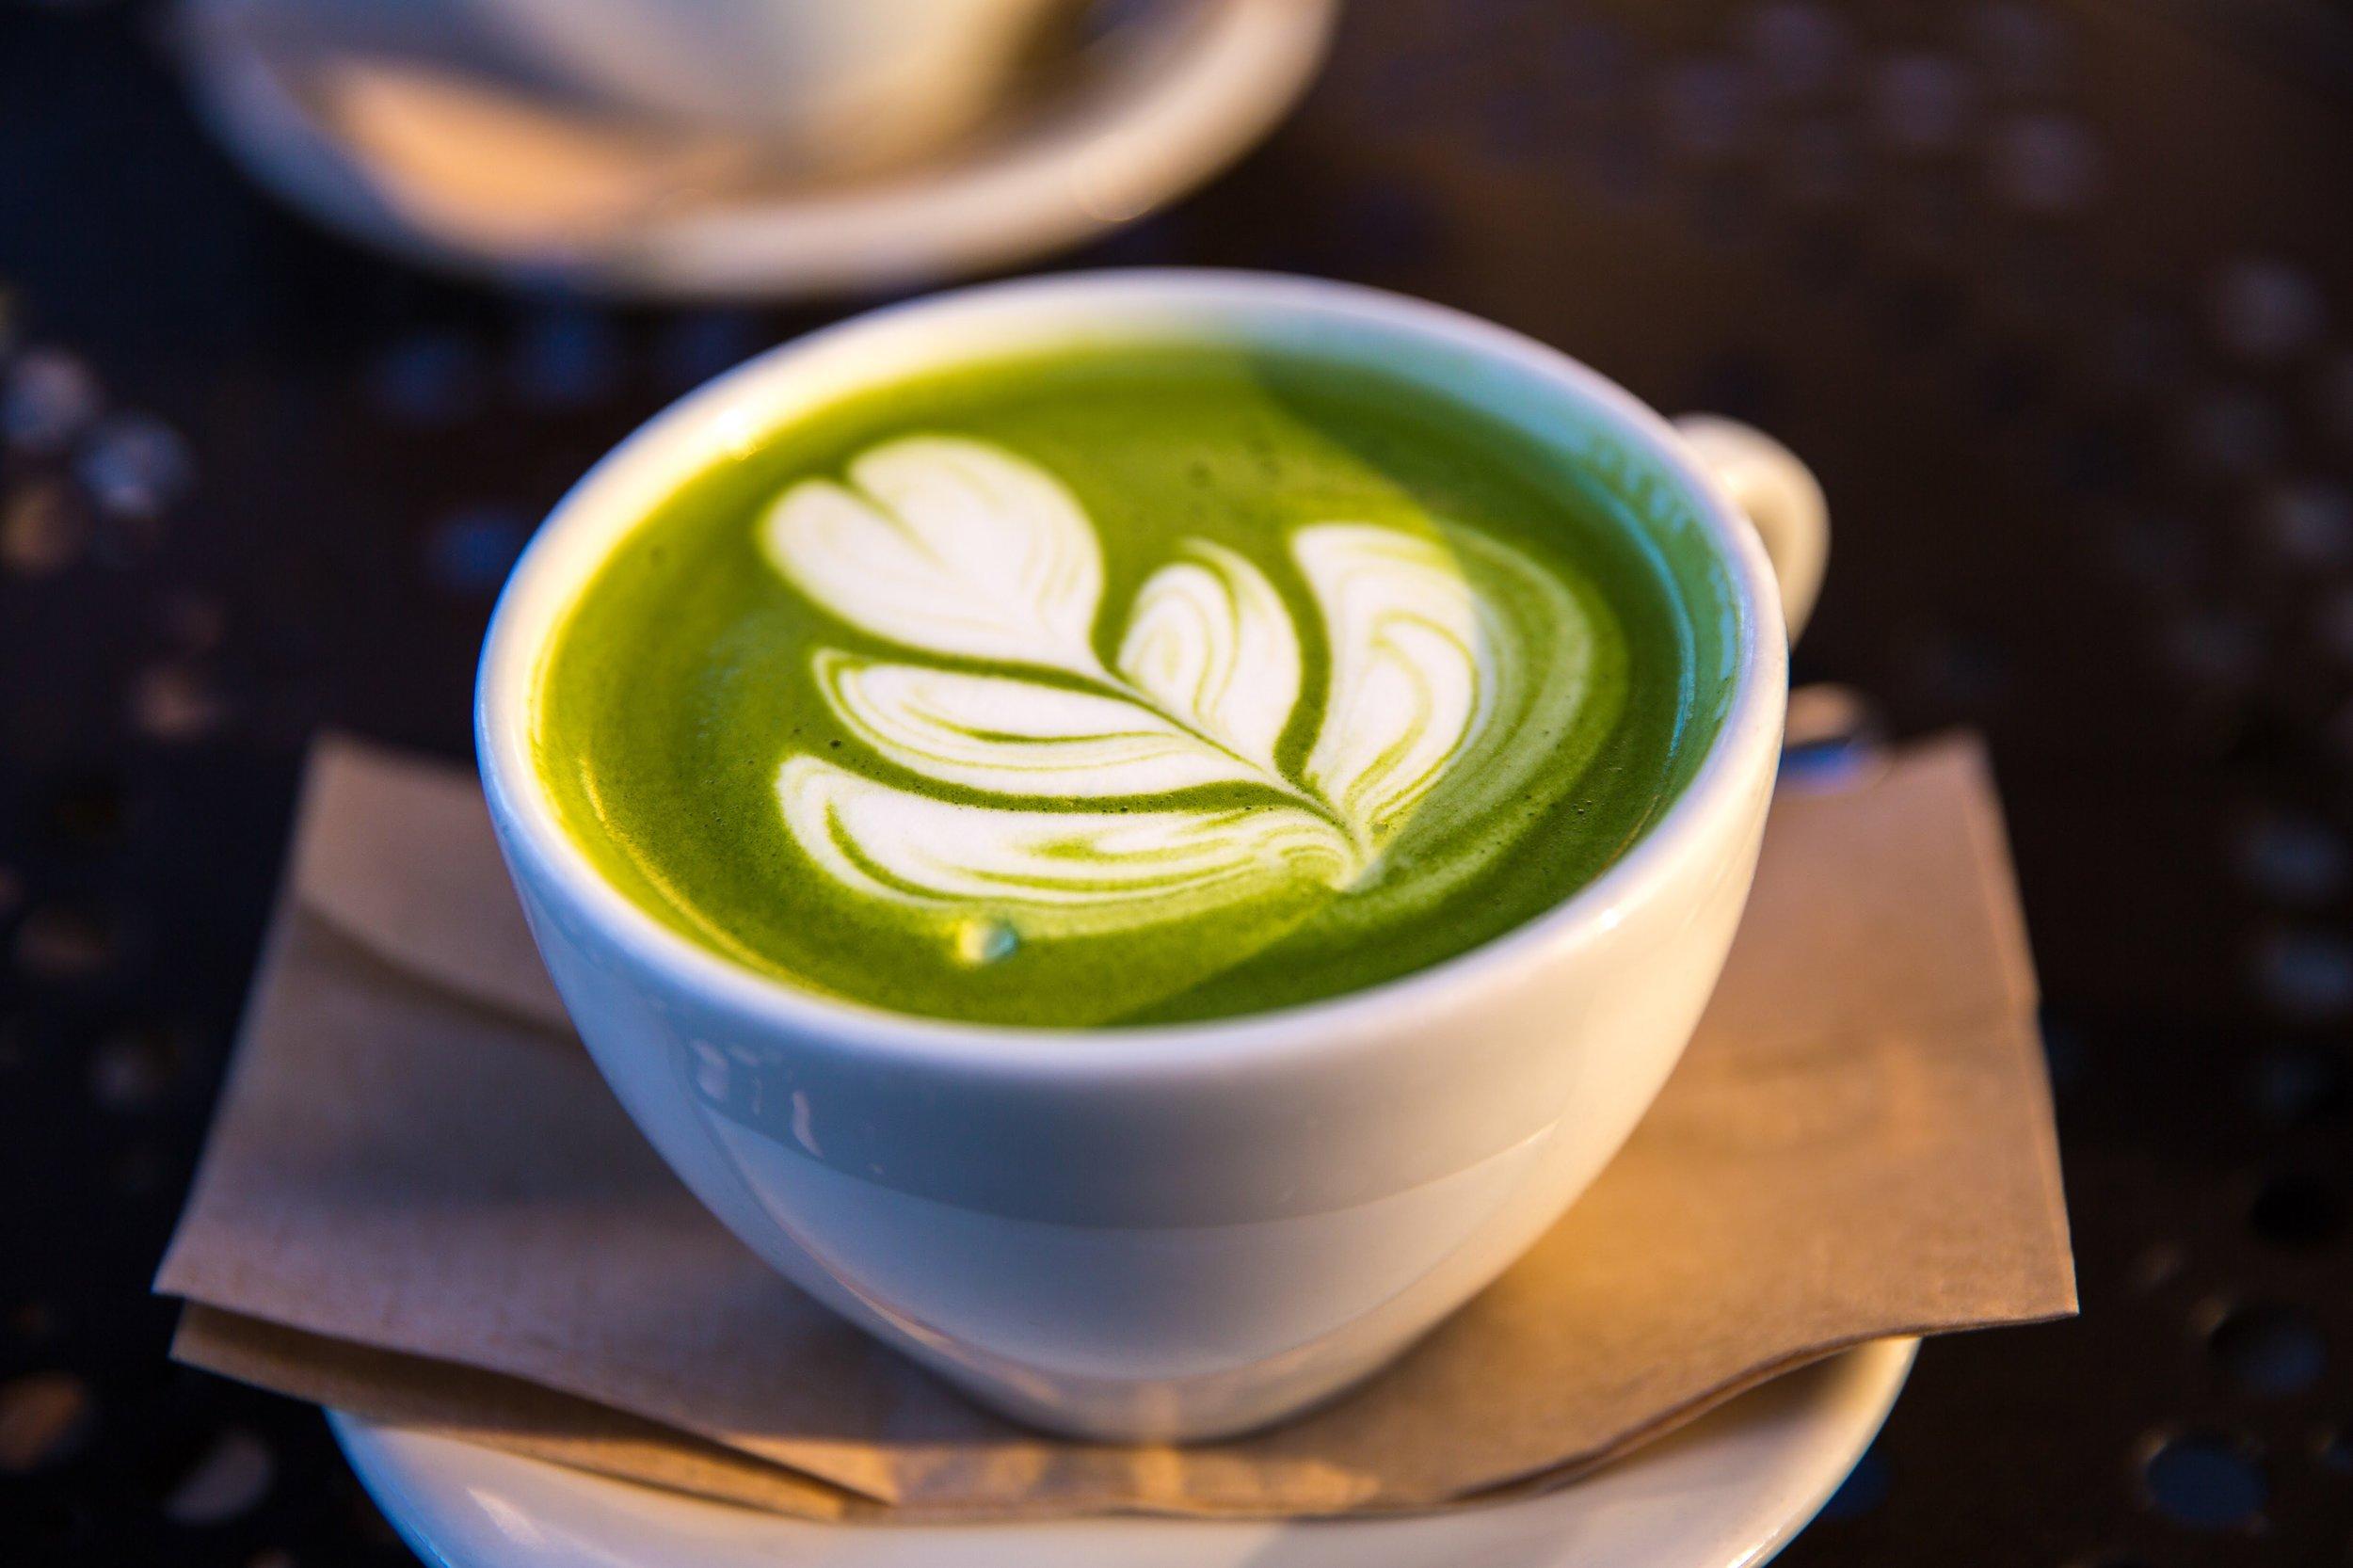 Recipe: Matcha Latte - it's sweet enough...serves 1